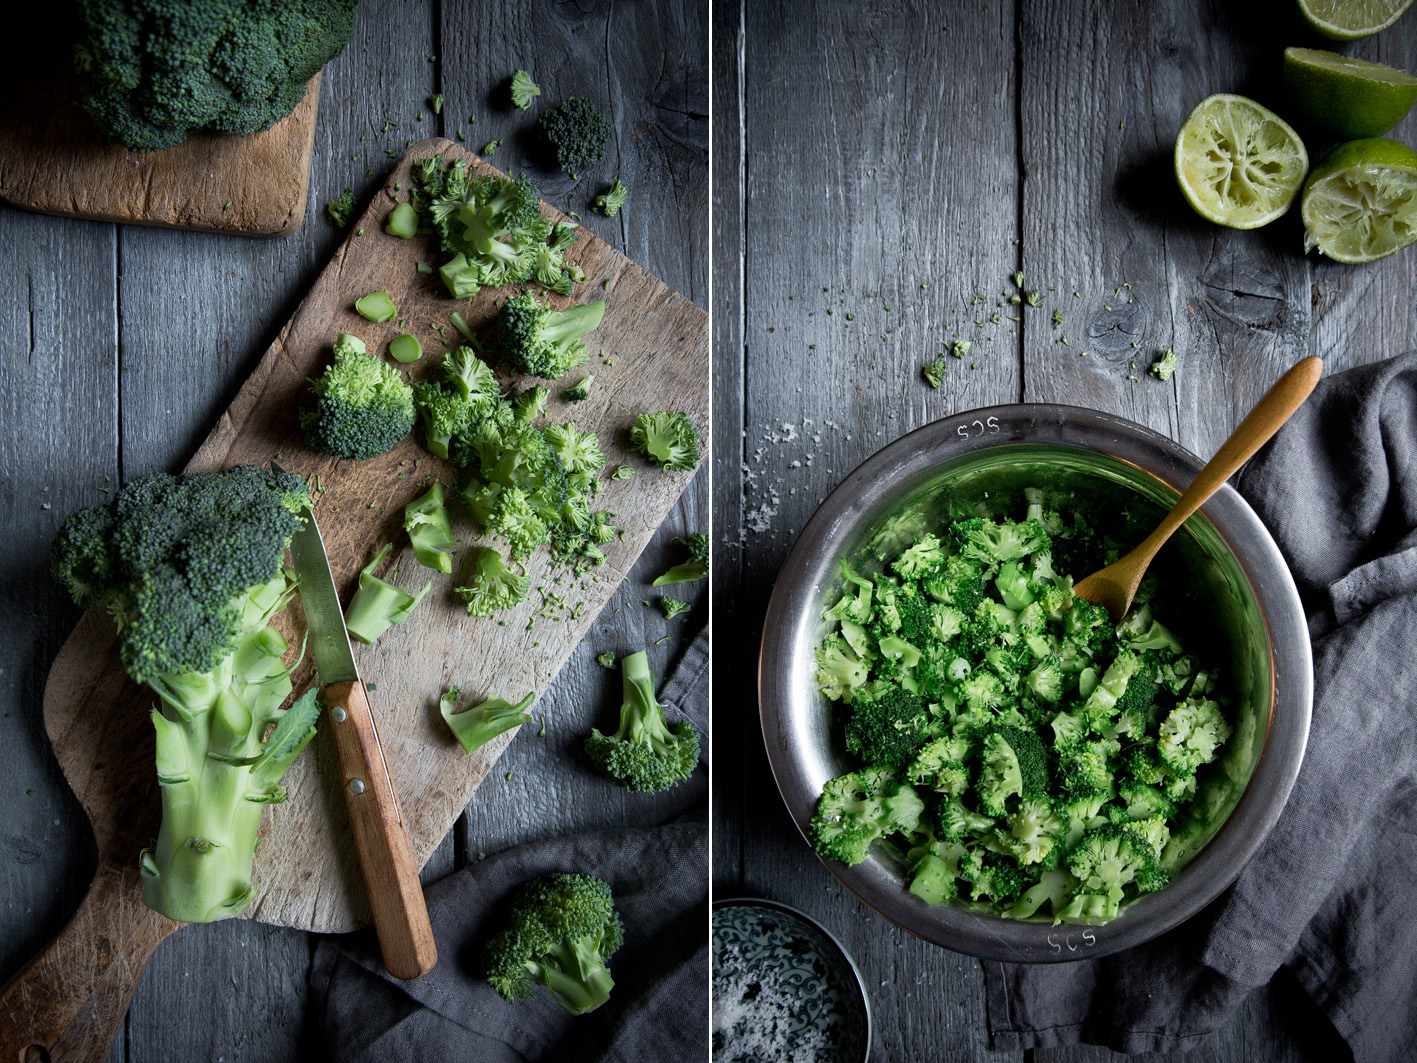 Broccoli roh essen